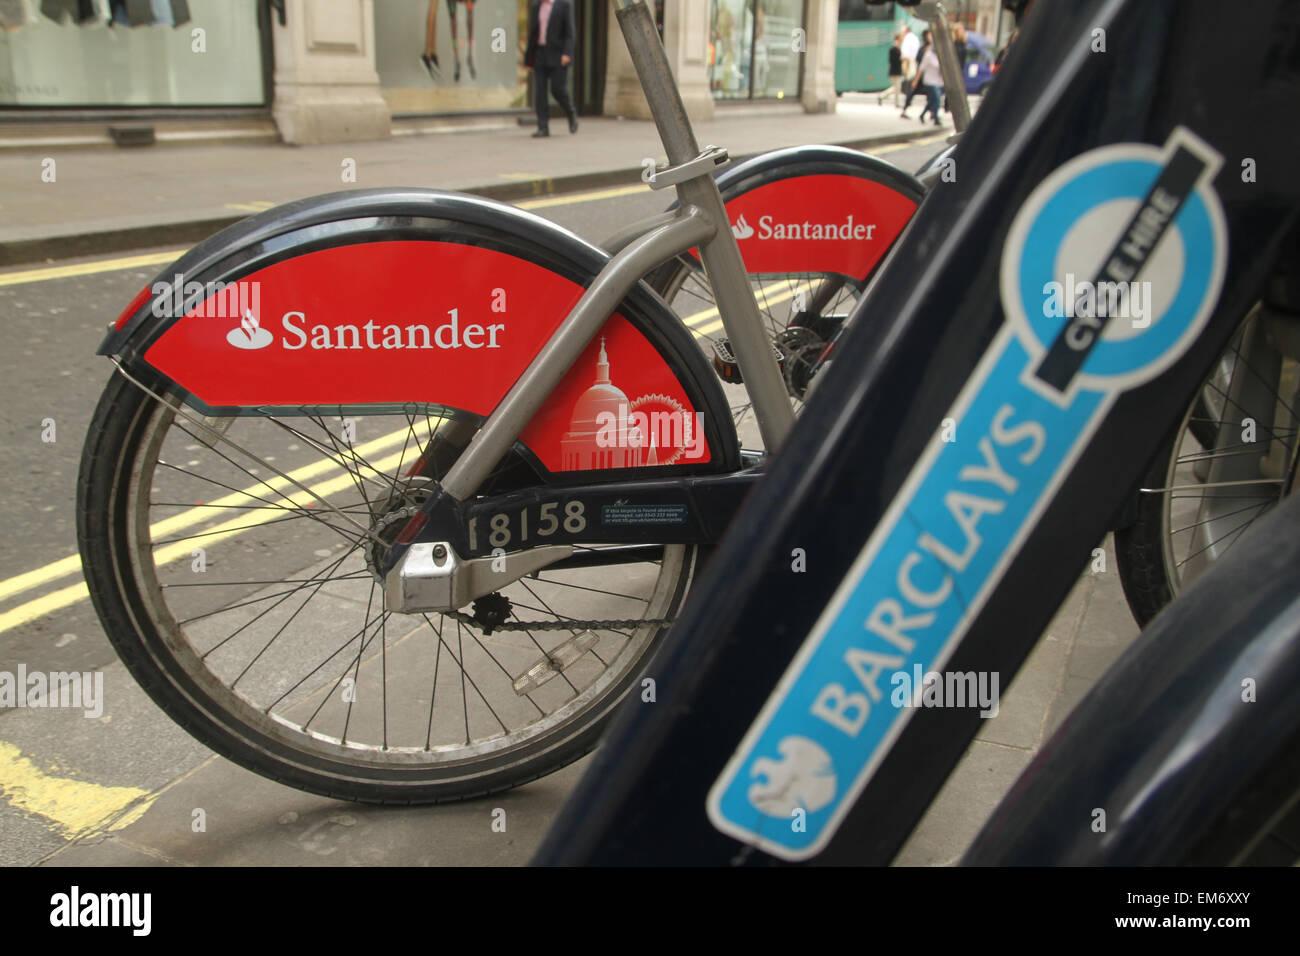 London, UK. 16 April 2015. Illustratinon of St Paul's on a Santander Bike docked at Little Argyll Street, on one - Stock Image